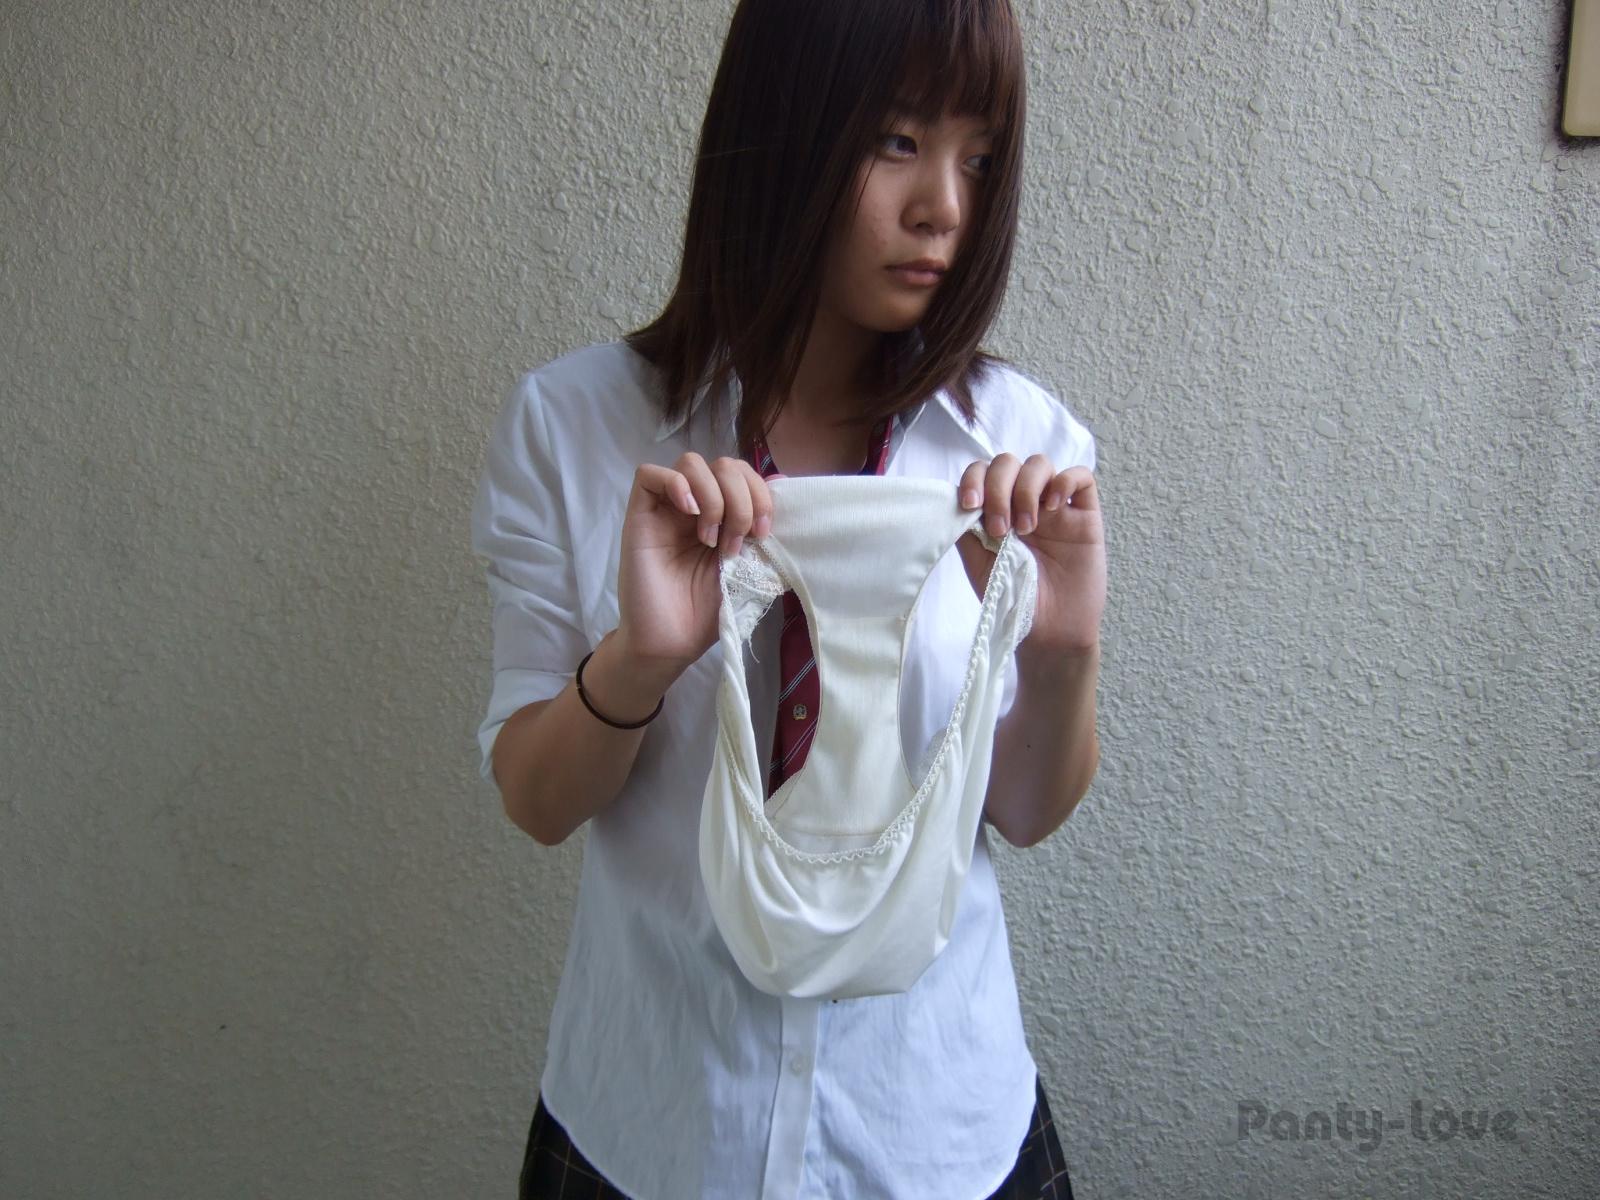 [Panty-love]ゆかり[2V134P]